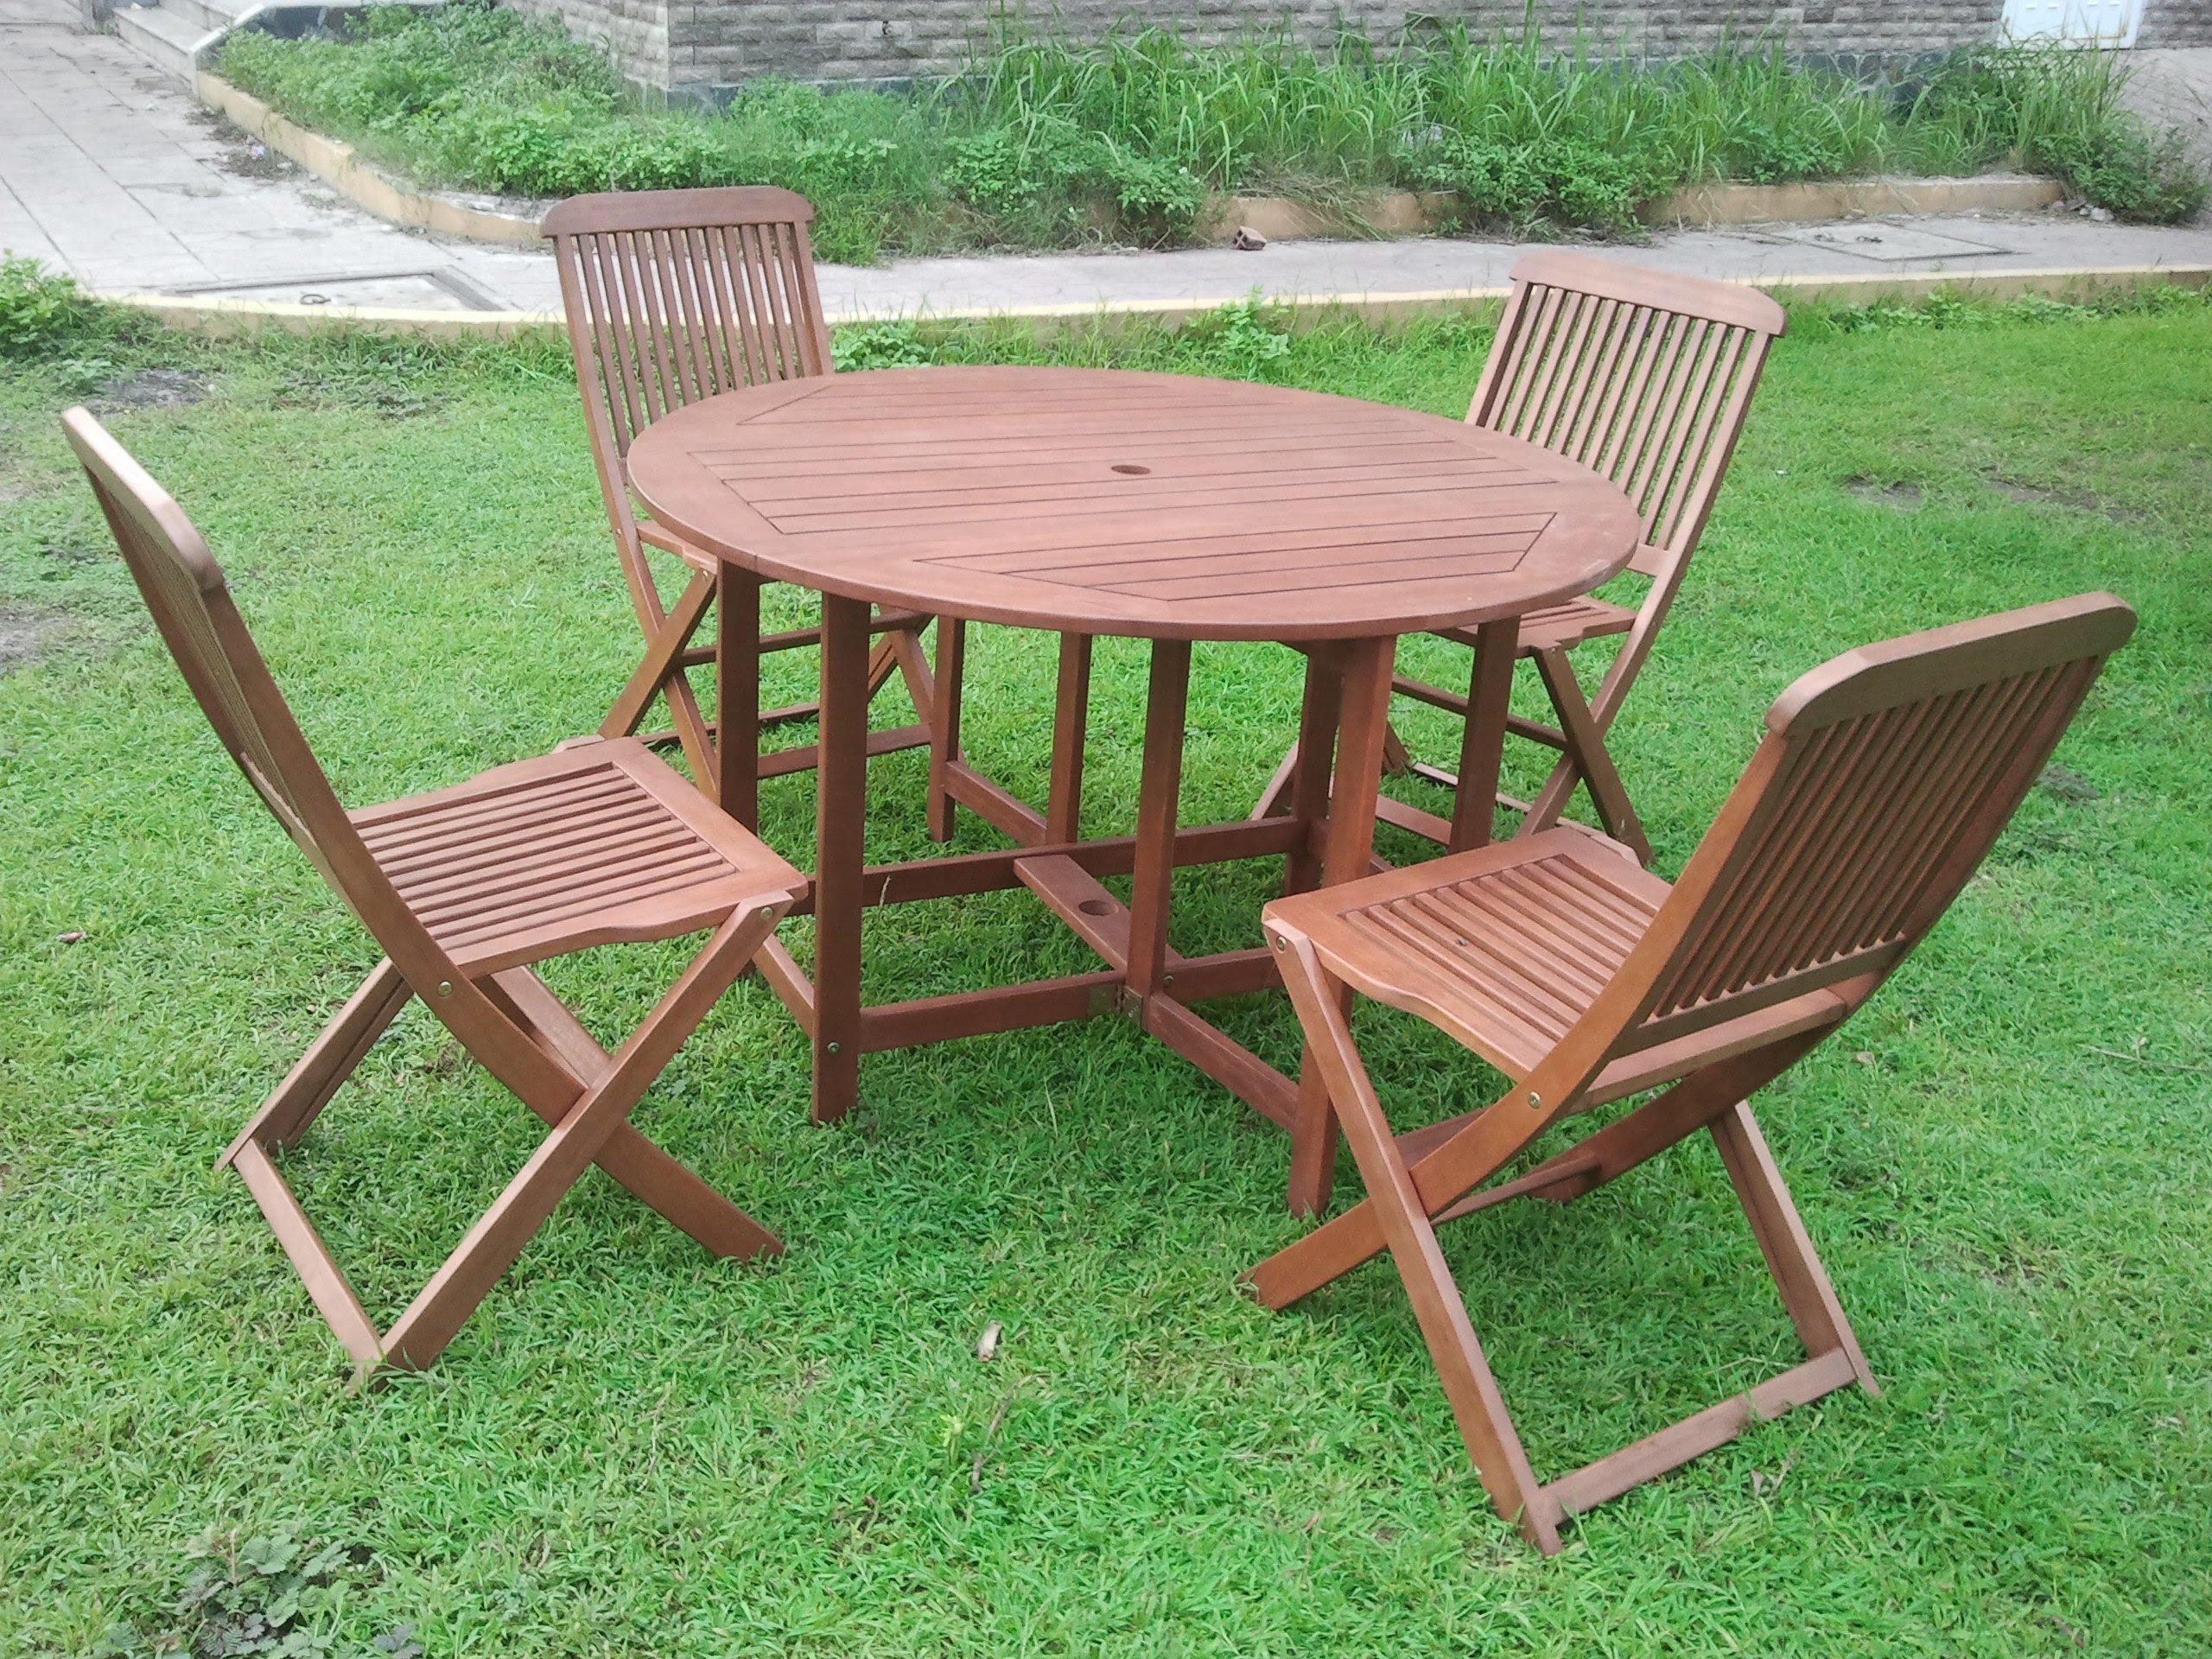 Elegance 4 Seater Folding Round Patio Dining Set - Simply Wood